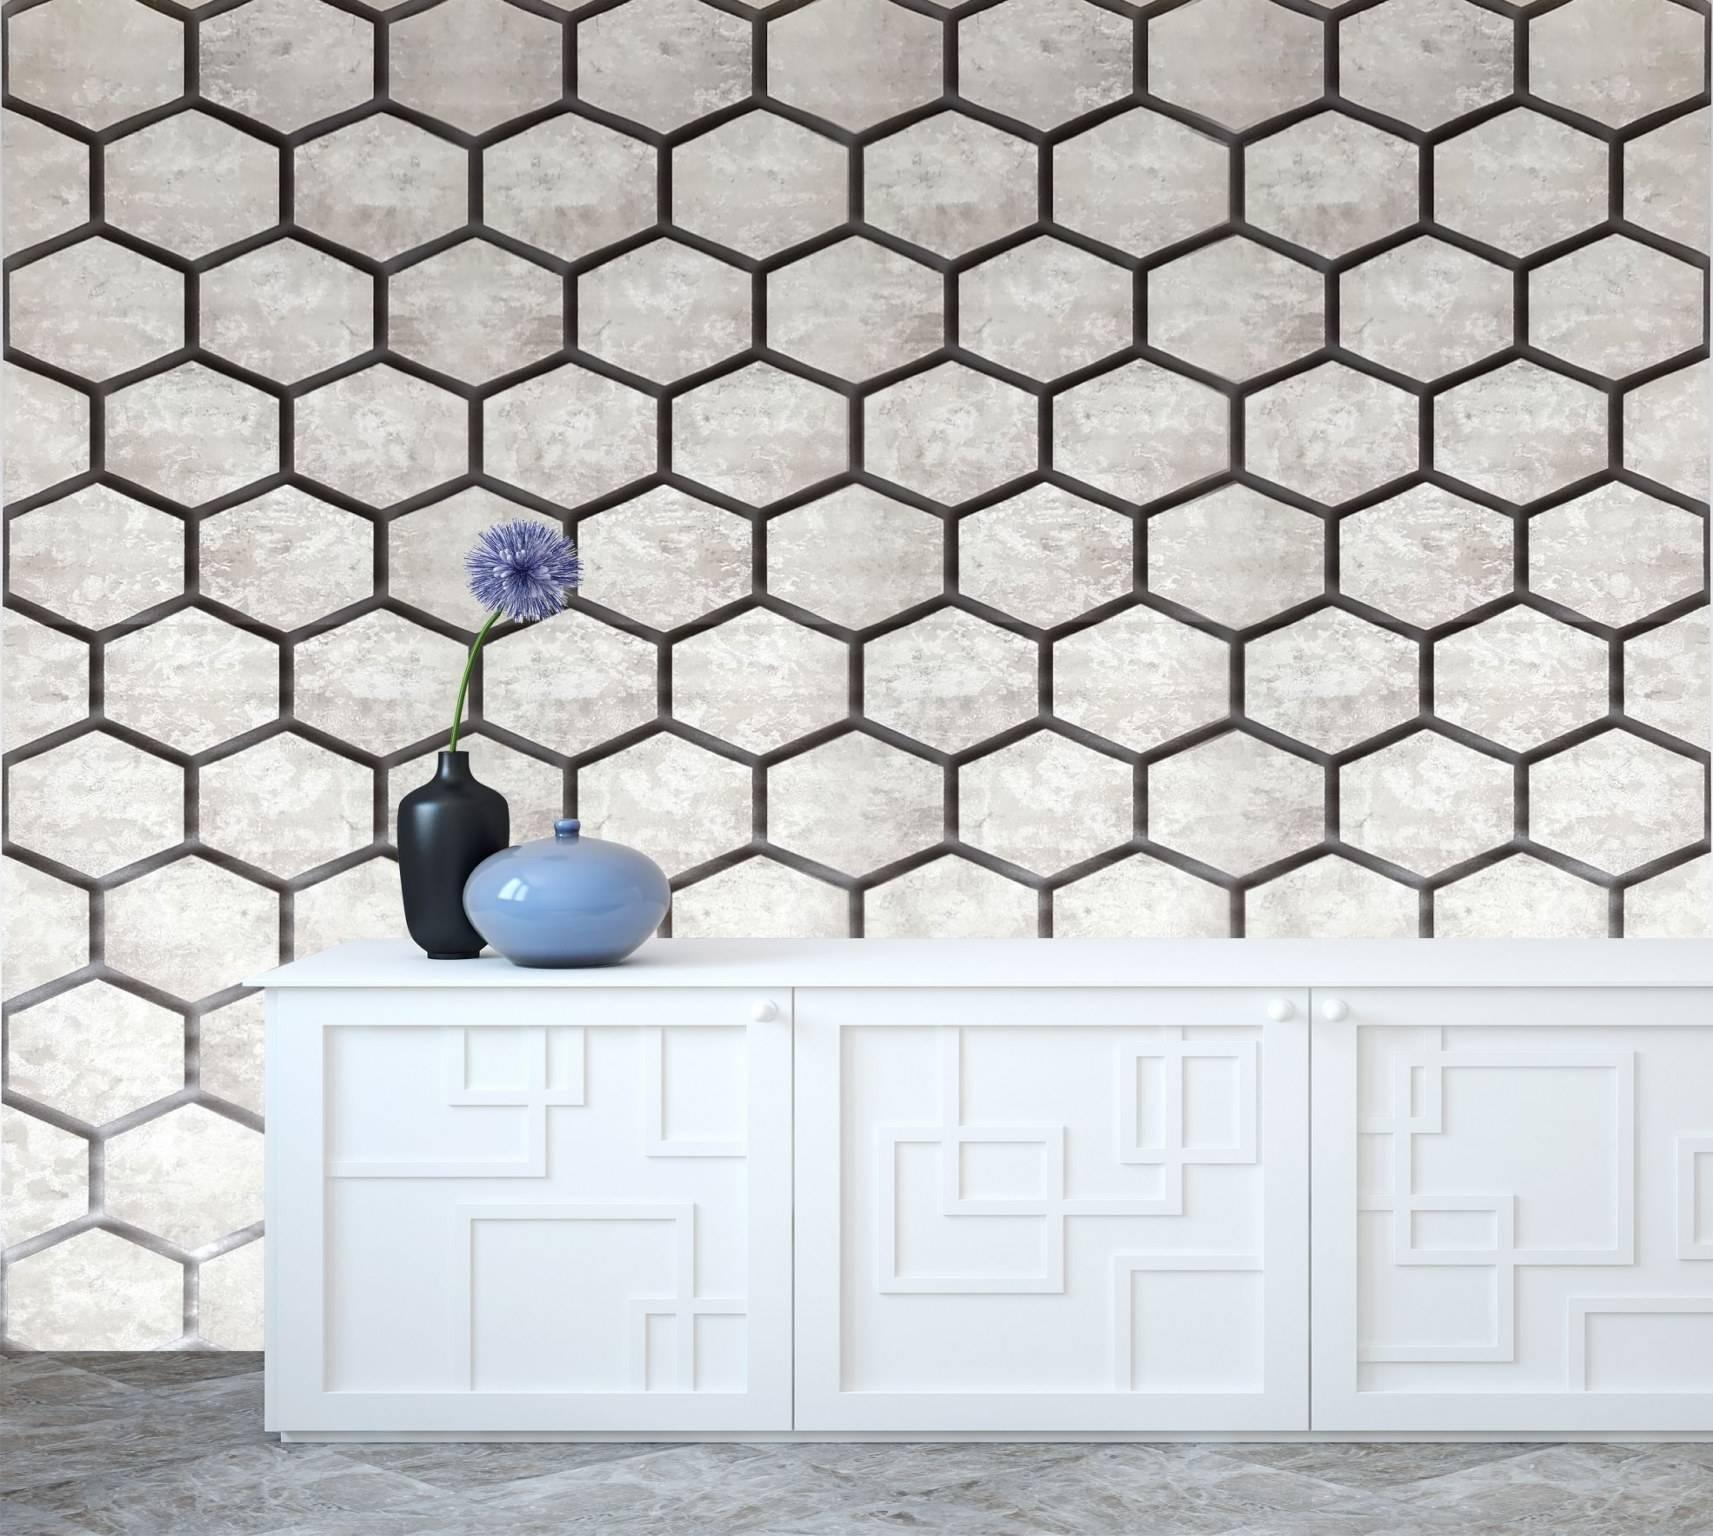 geometric tile patterns interior xpression vinyl geometric patterns wallpapers black of geometric tile patterns